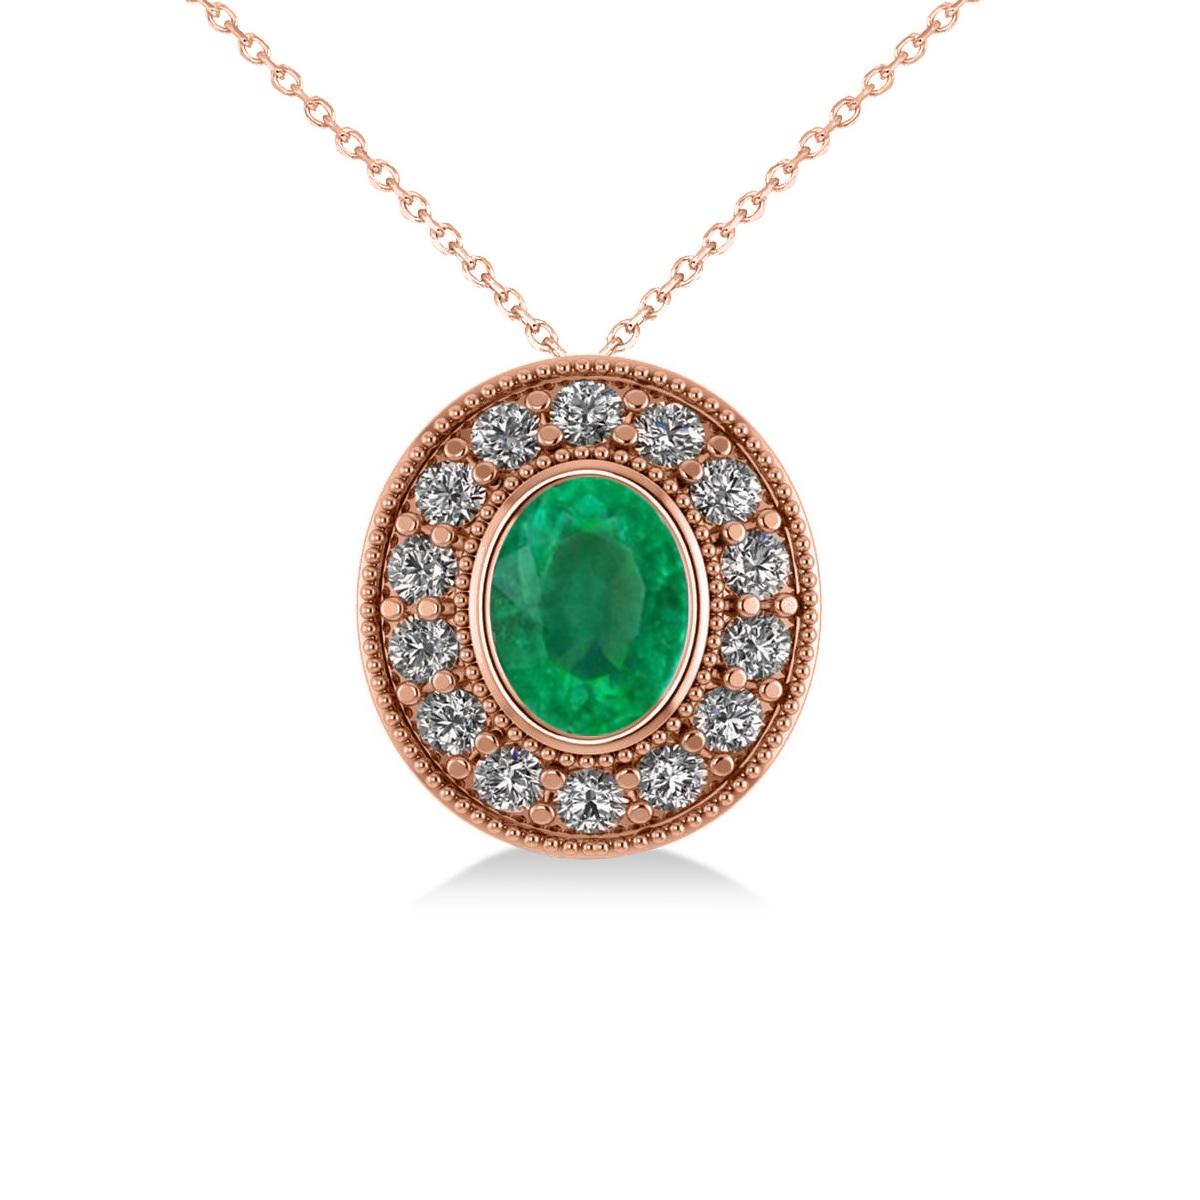 Emerald & Diamond Halo Oval Pendant Necklace 14k Rose Gold (1.27ct)